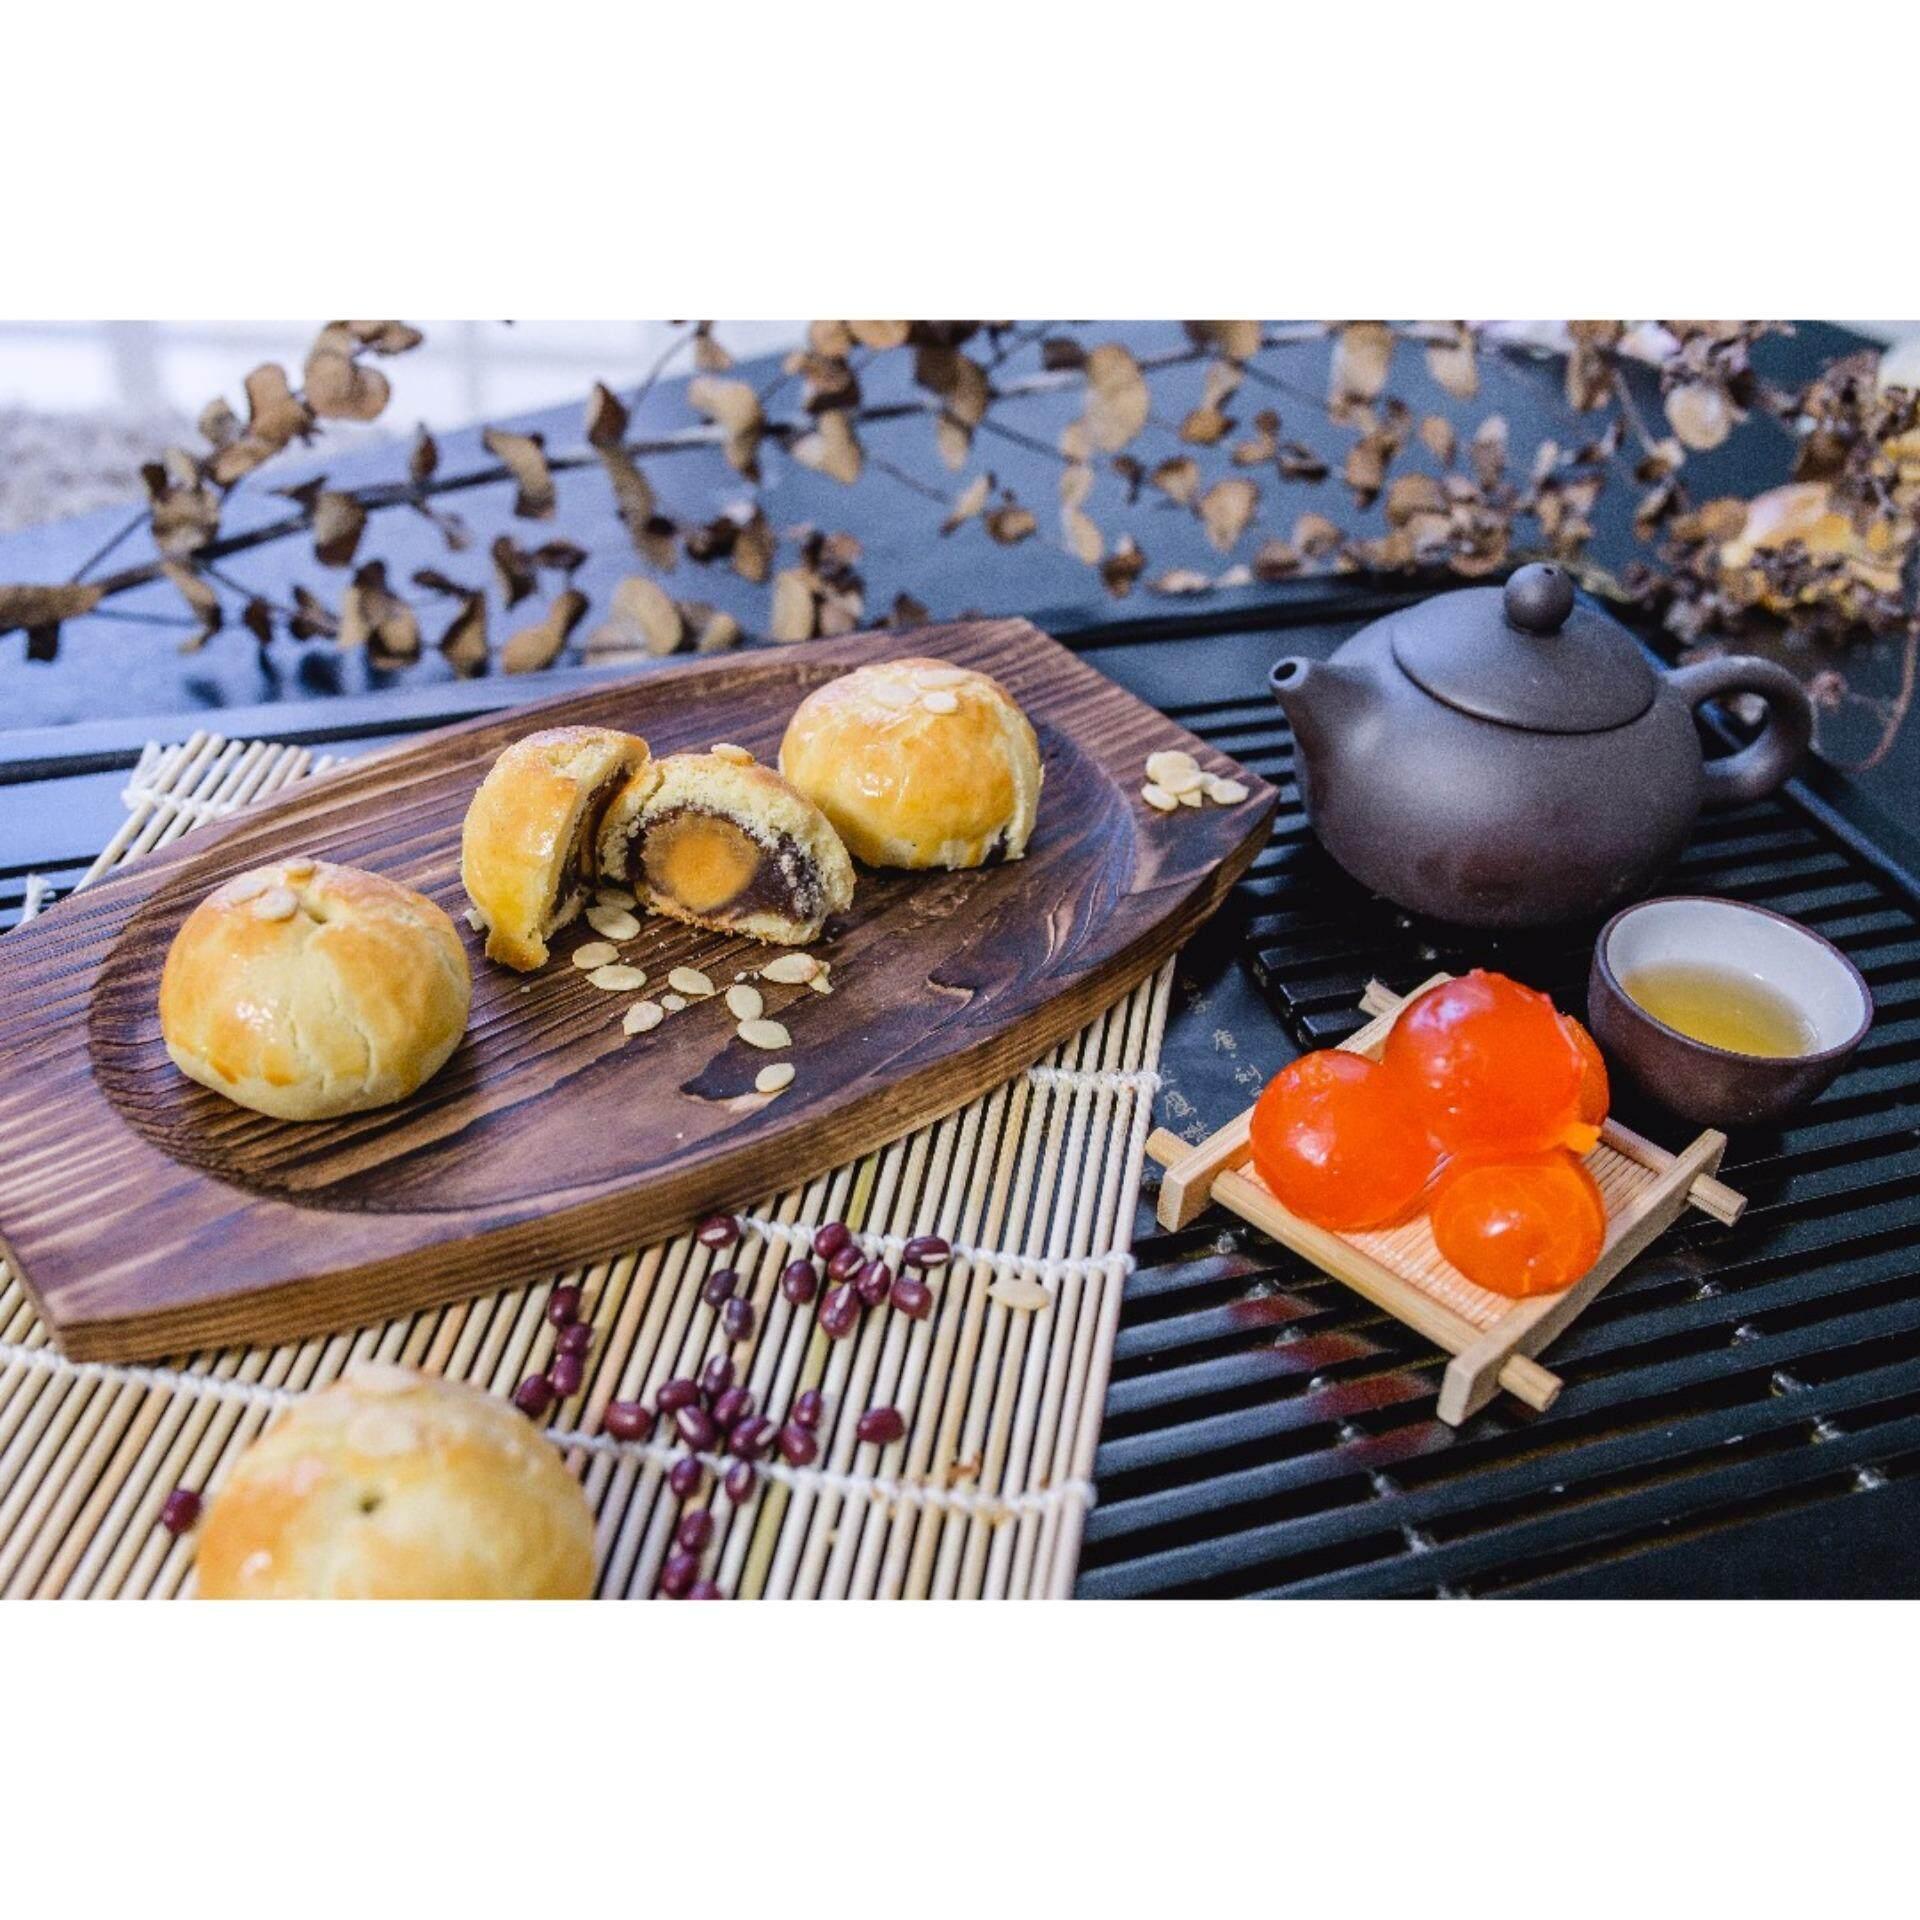 Hejia Shanghai Mooncake - Feicui Pandan Lotus Flavor With Yolk (6 Pieces in a Box)   + (6)